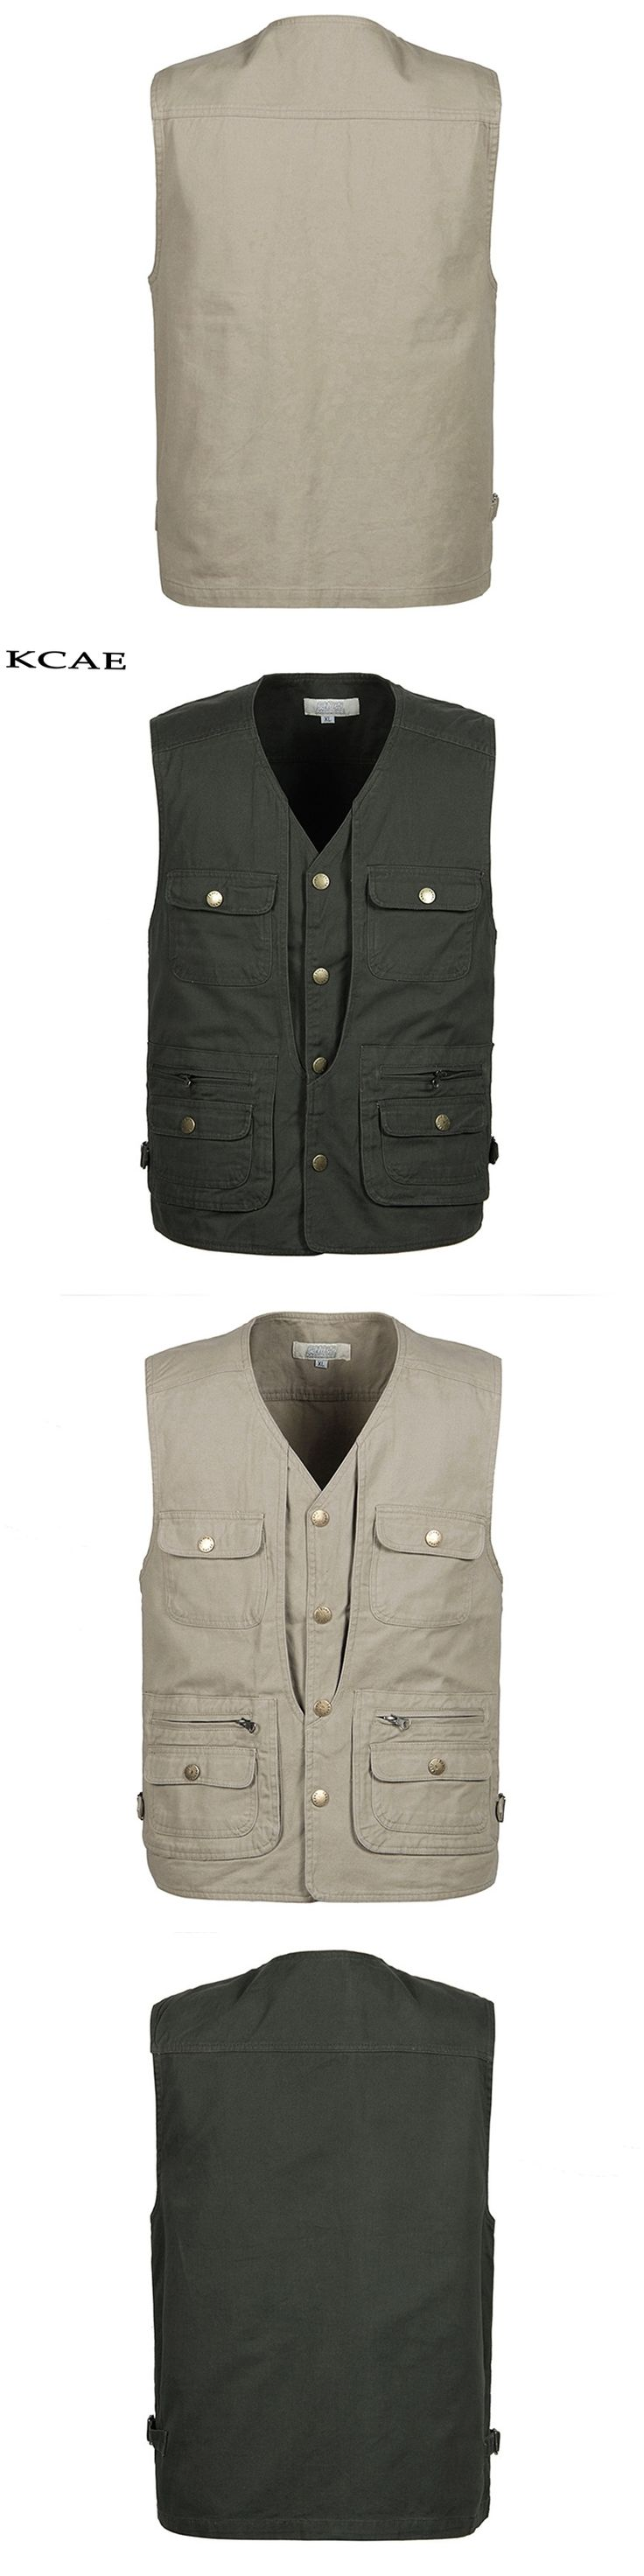 2017 New Arrival Summer Travels Vests Men's Vest XL-4XL Photographer Vests Causal Shooting Vest with Many Pocket